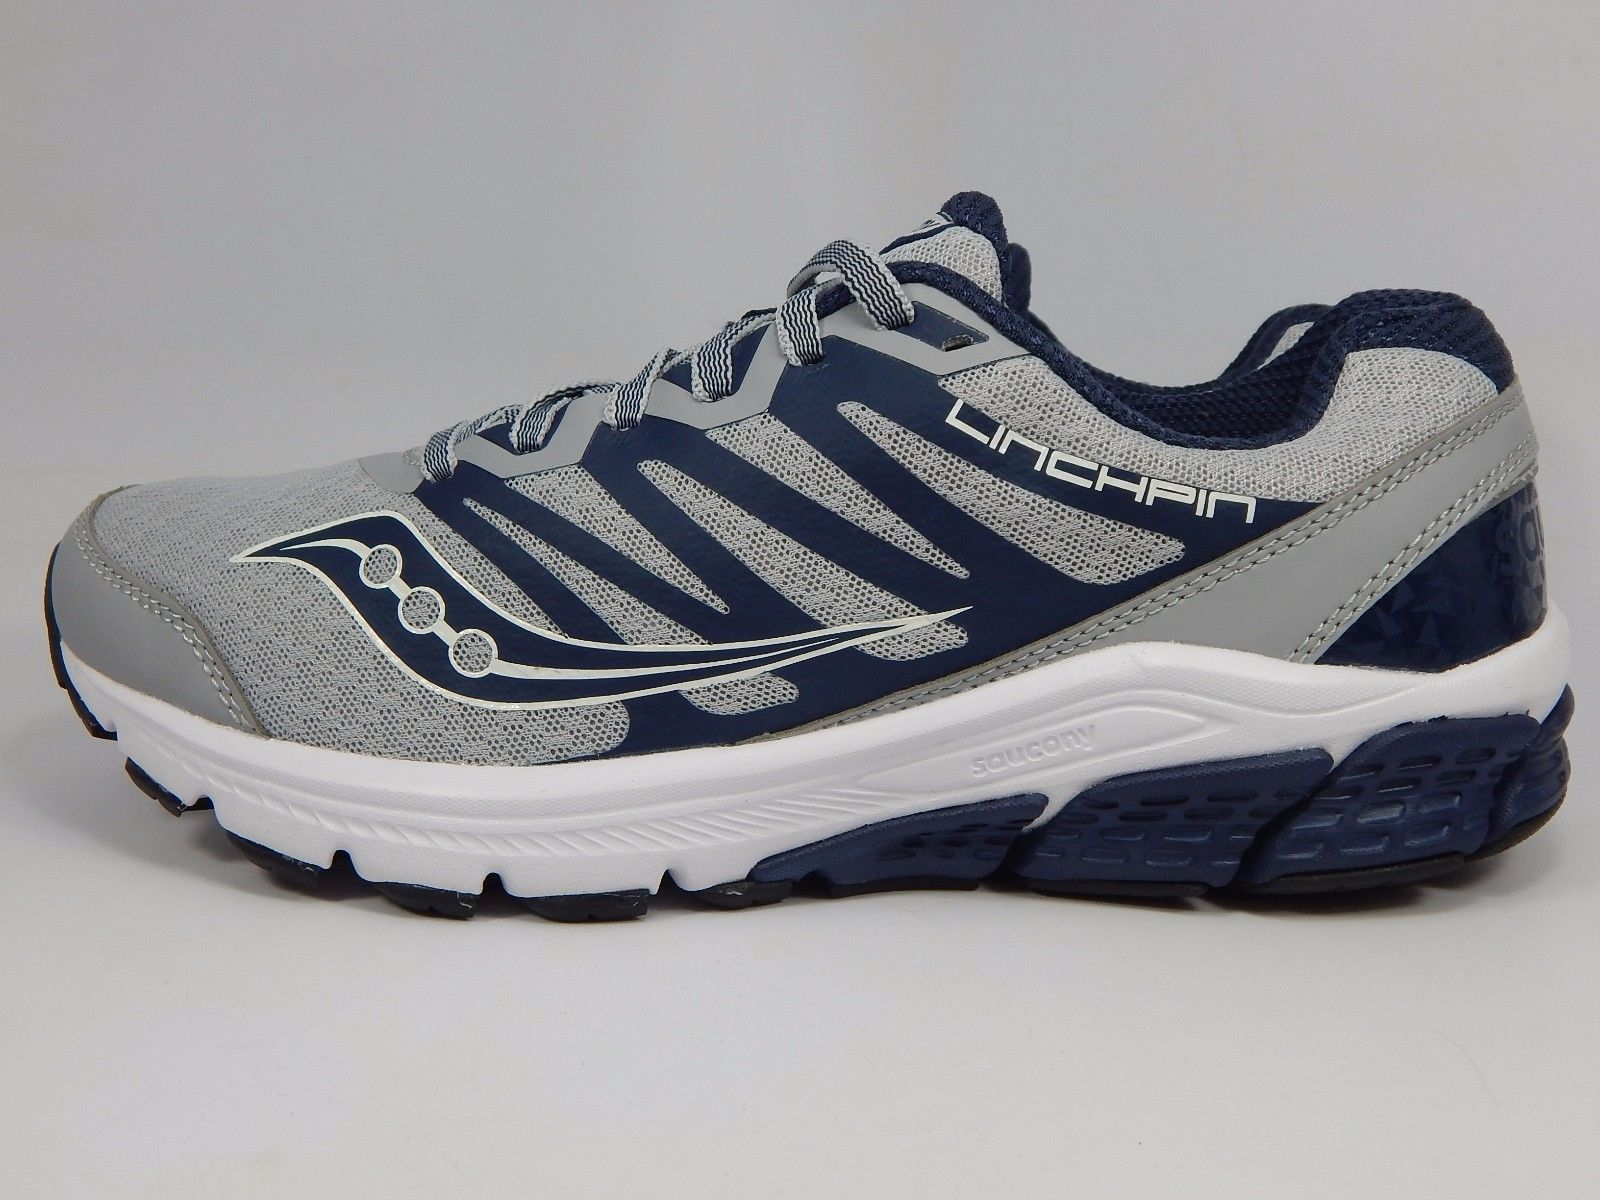 Saucony Linchpin Men's Running Shoes Size US 9 M (D) EU 42.5 Gray Navy S20334-1